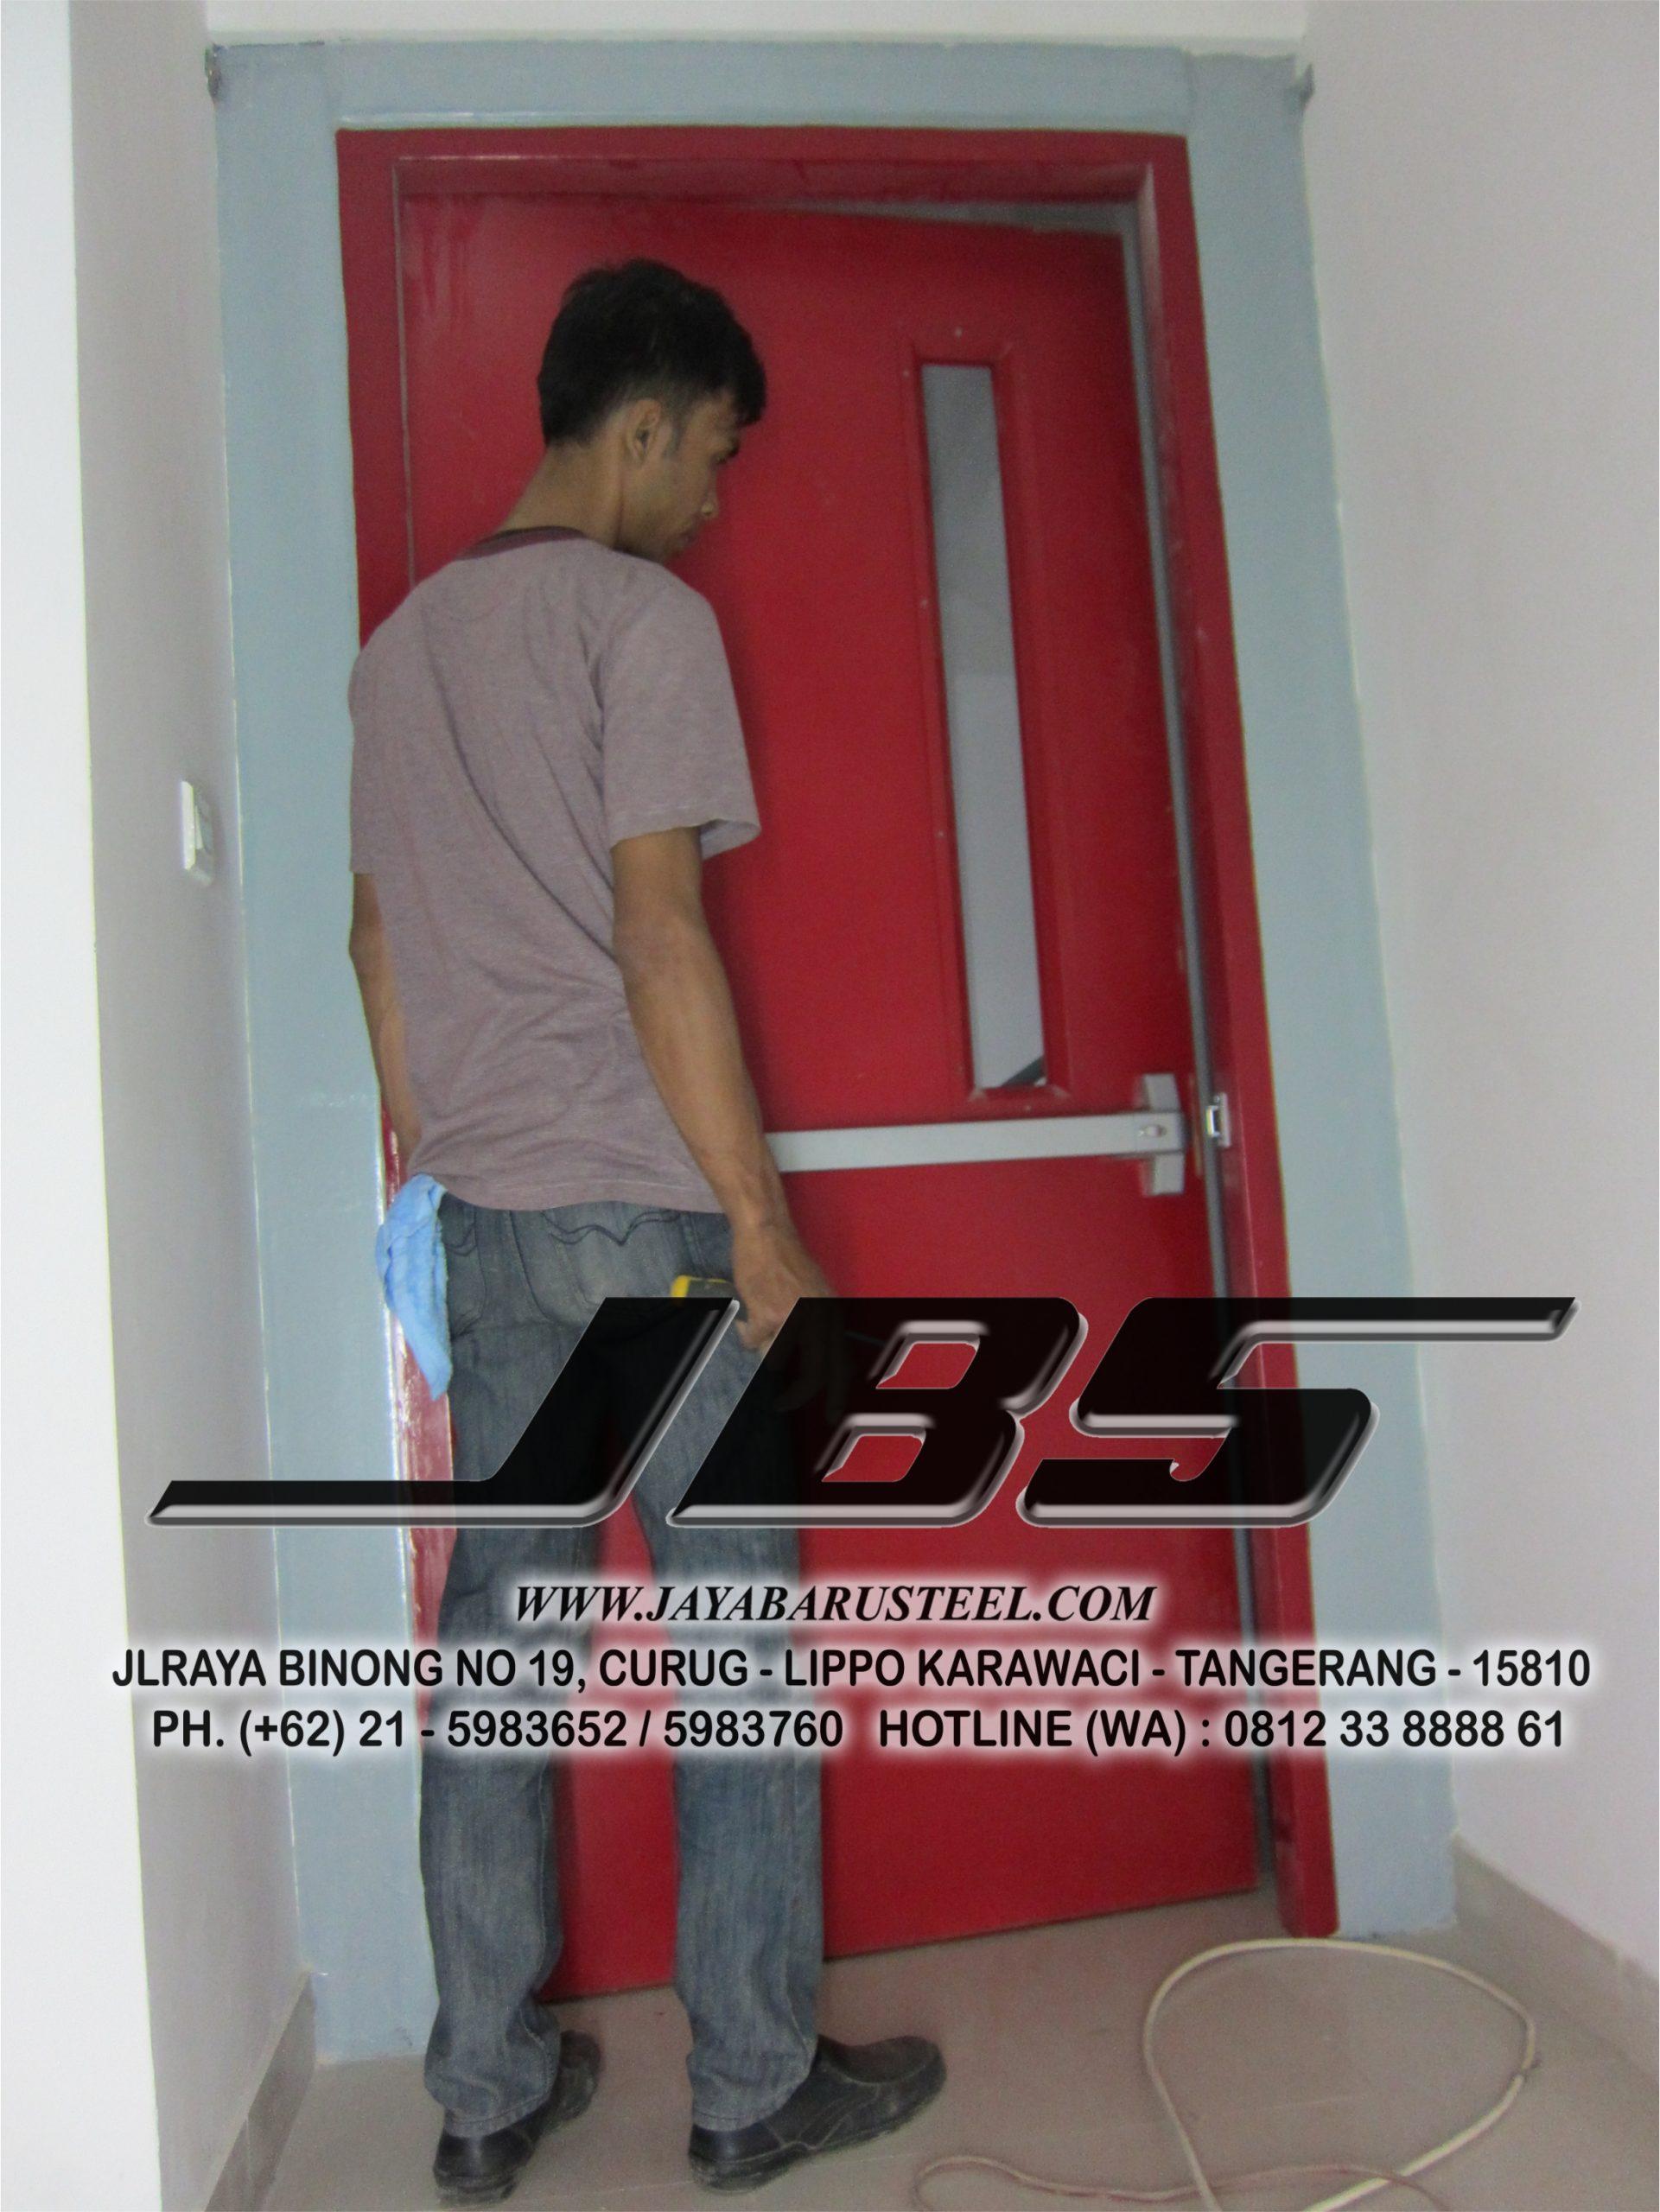 Harga Pintu Garasi Wina Jakarta, HOTLINE 081-233-8888-61